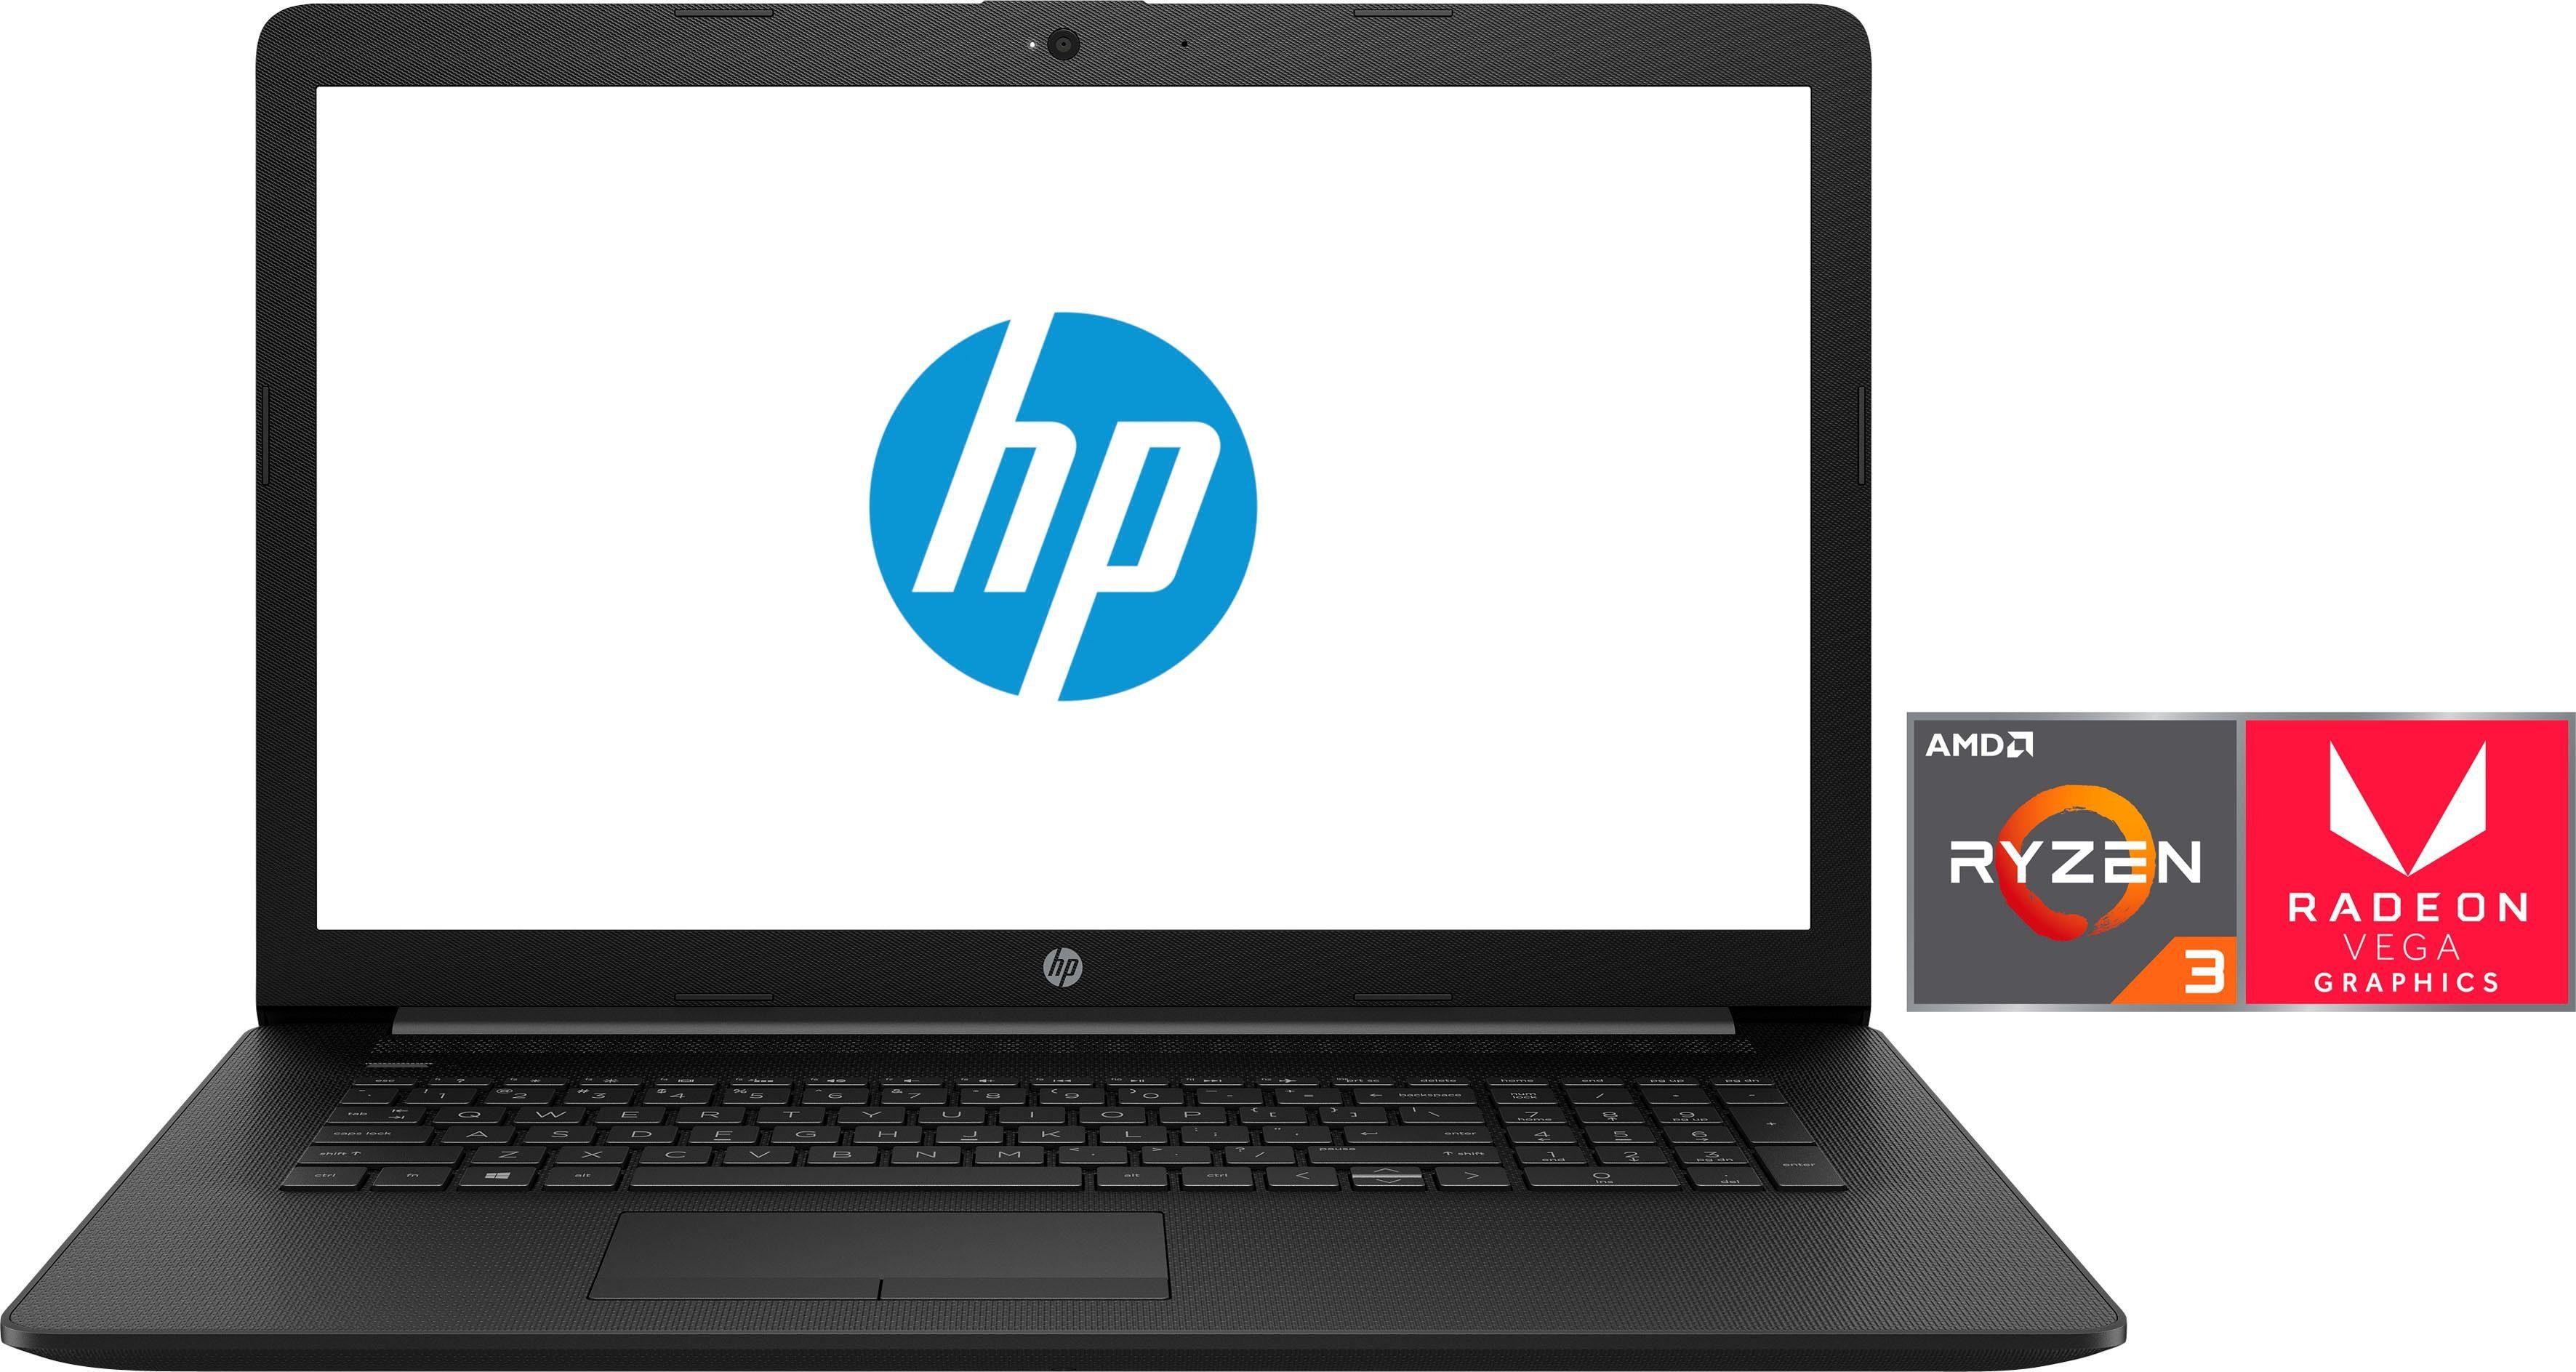 HP 17-ca0203ng Notebook (43,9 cm/17,3 Zoll, AMD Ryzen 3, Radeon, 1000 GB HDD, 128 GB SSD, inkl. Office 365 Personal (ESD)